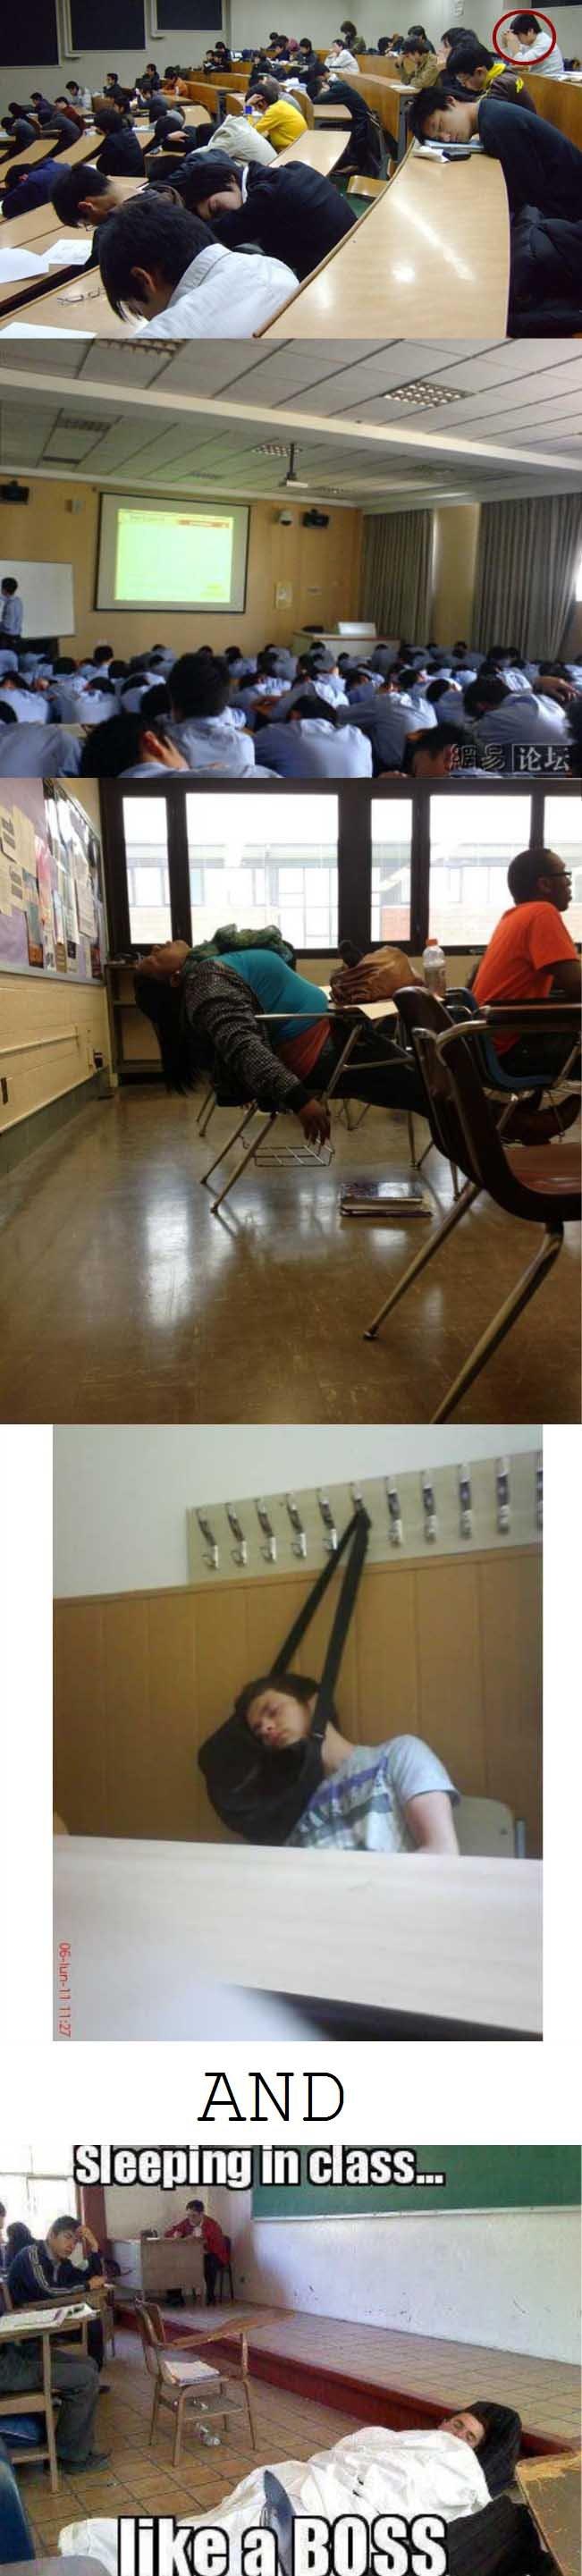 classroom is best place to sleep. .. LUNCH BREAK!!! classroom is best place to sleep LUNCH BREAK!!!